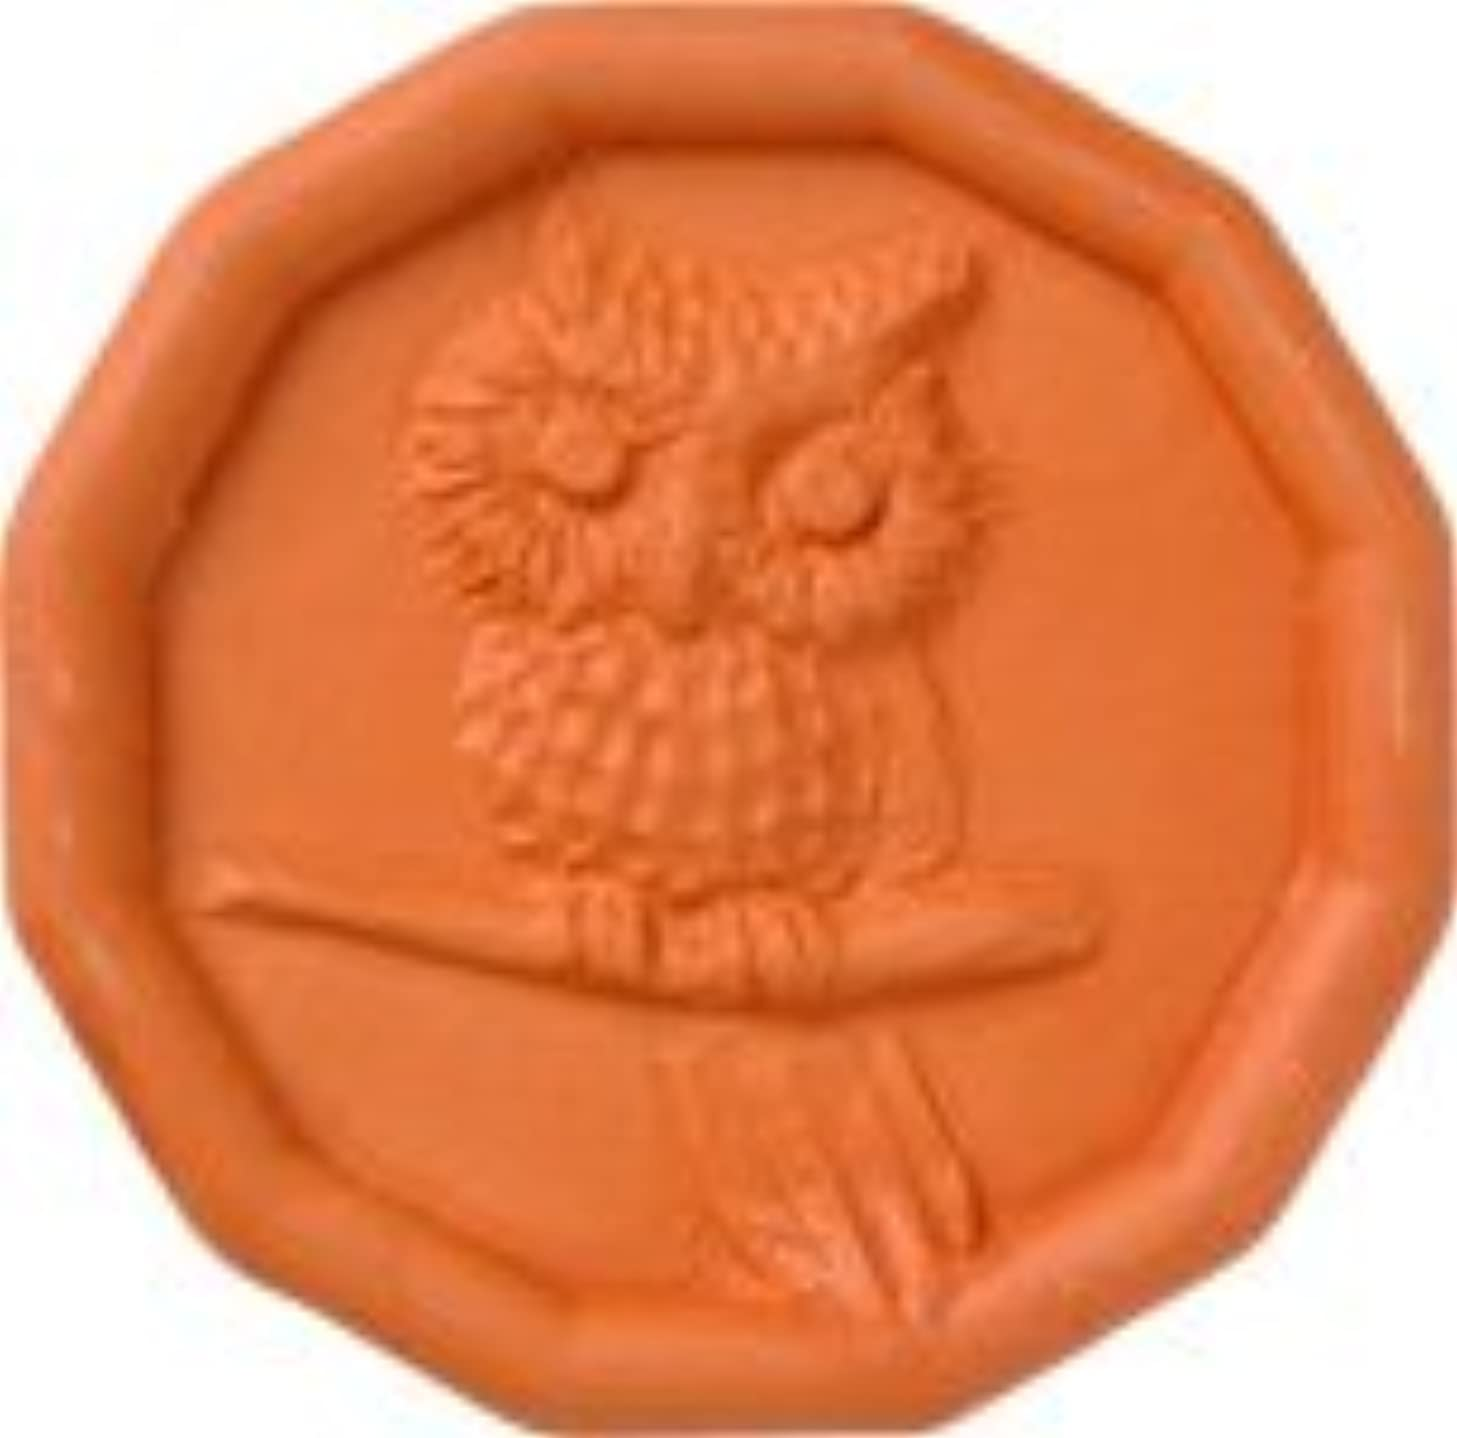 JBK Owl Terra Cotta Brown Sugar Saver (Original Version) (Original Version)